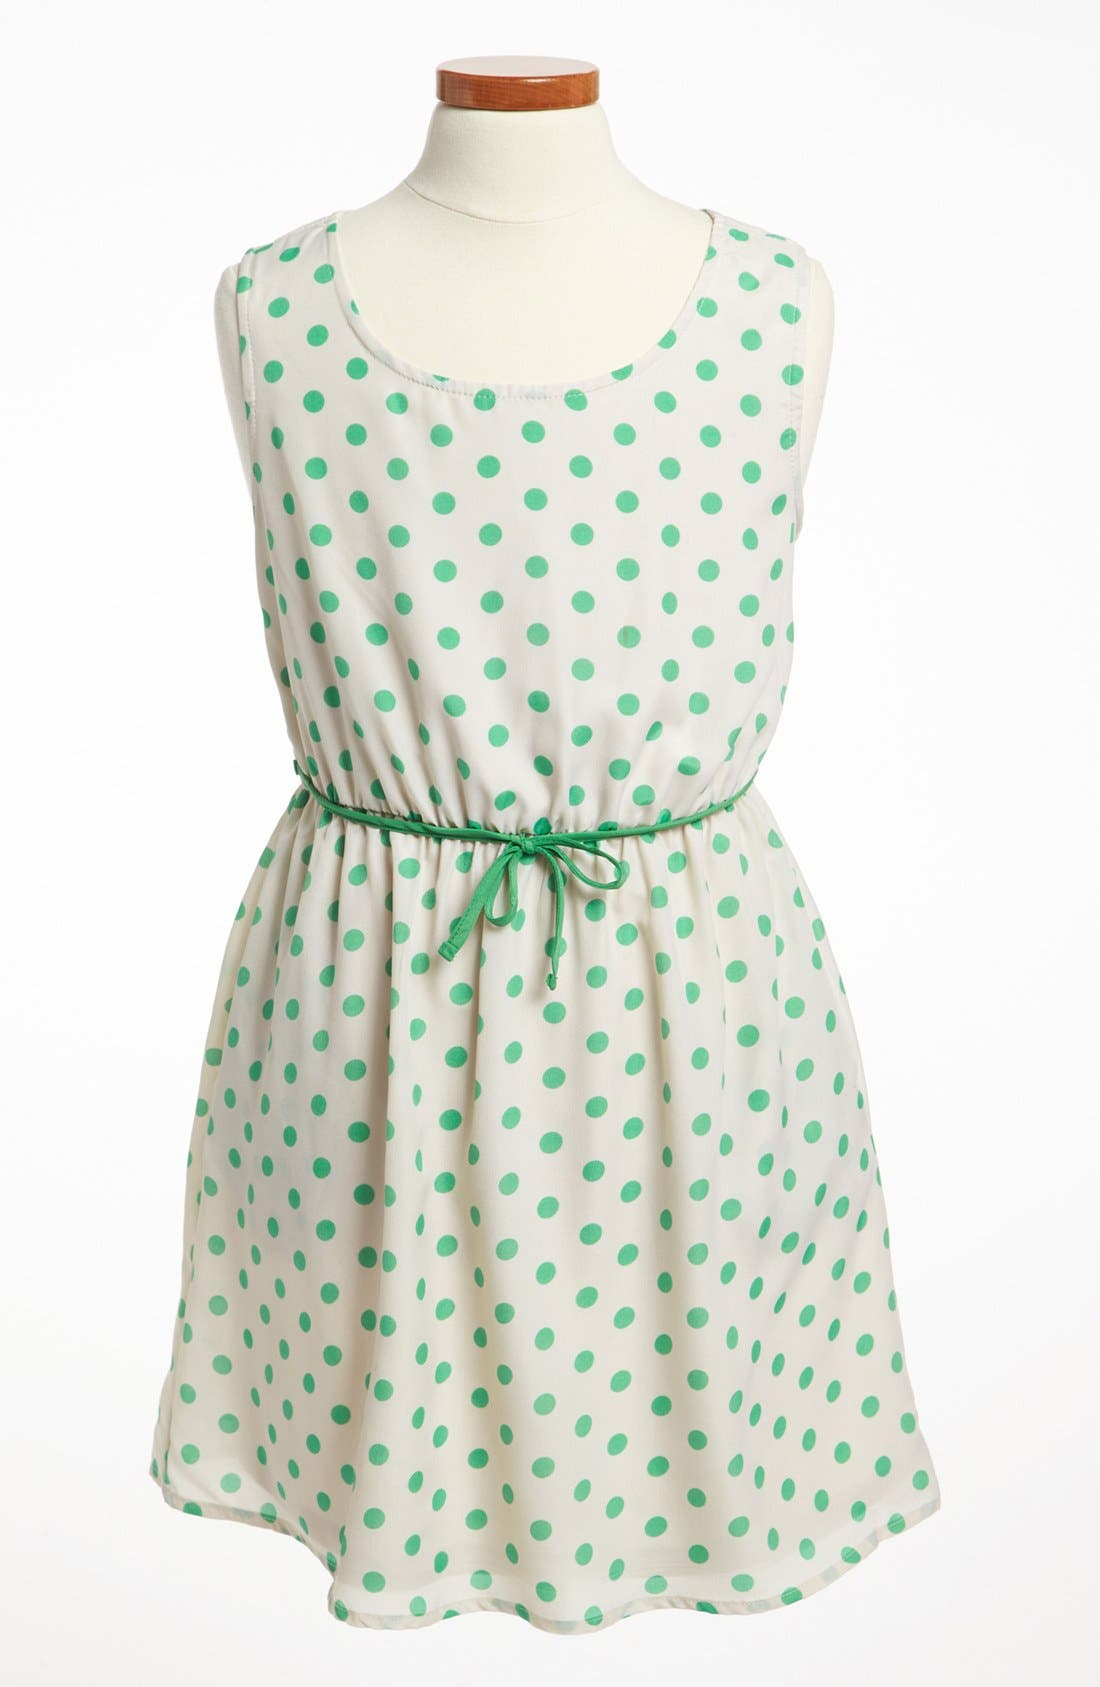 Main Image - Mia Chica Polka Dot Dress (Big Girls)